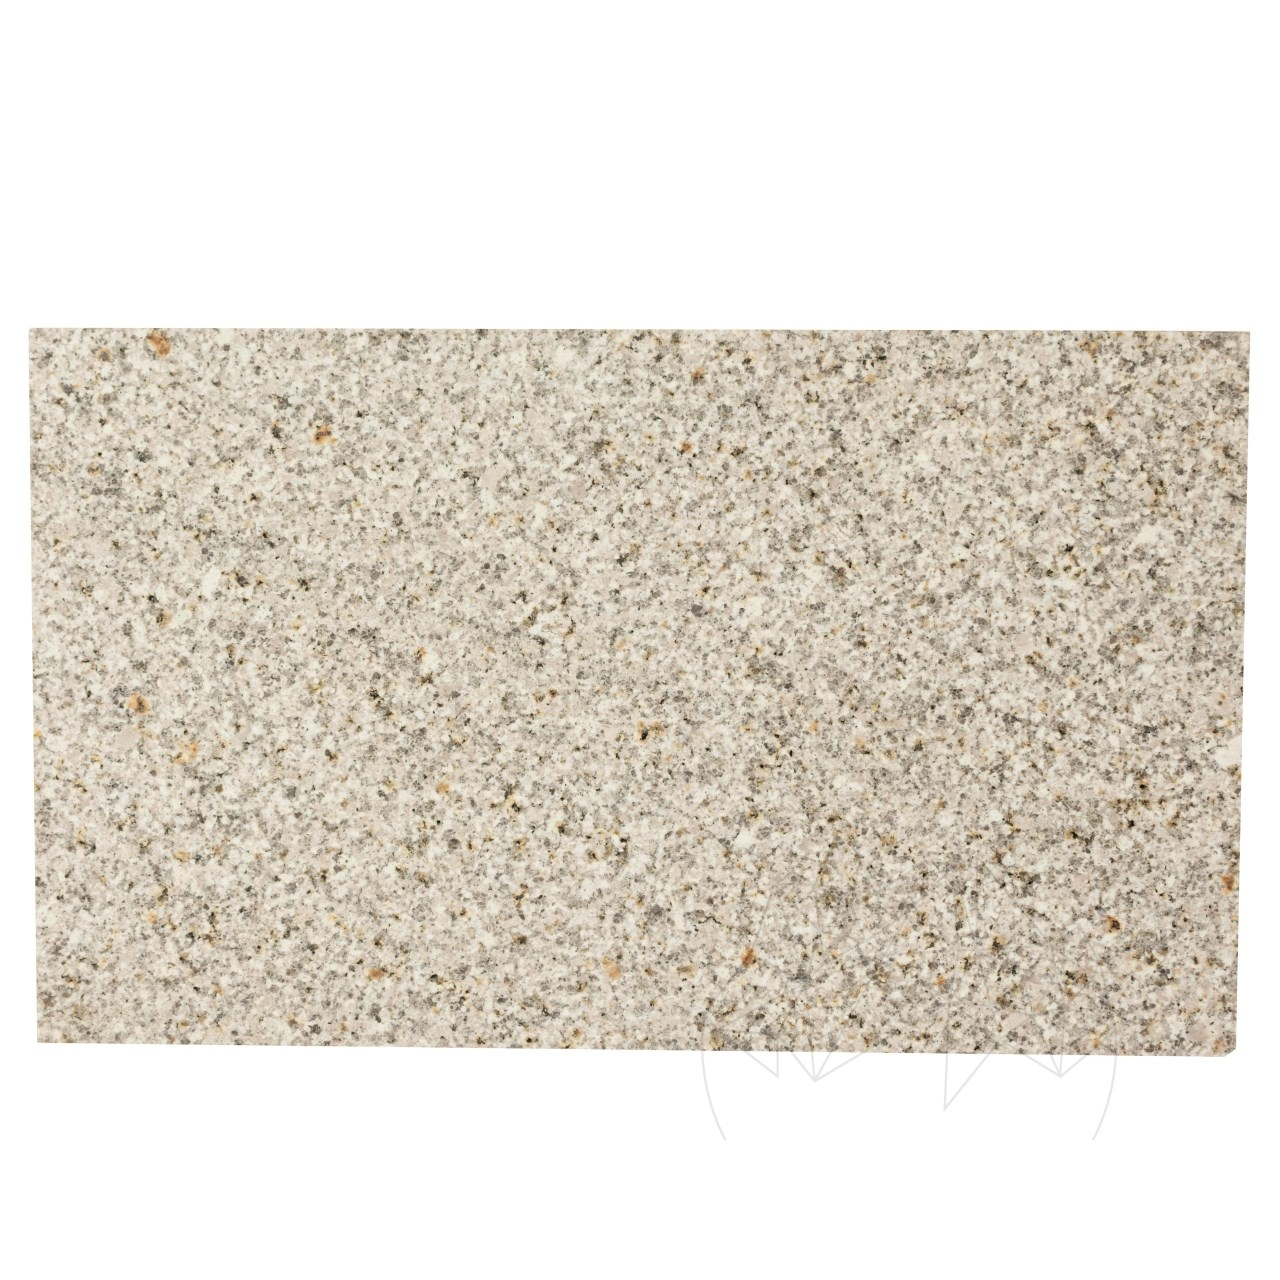 Pizza Stone Padang Yellow Honed Granite 50 x 30 x 2 cm